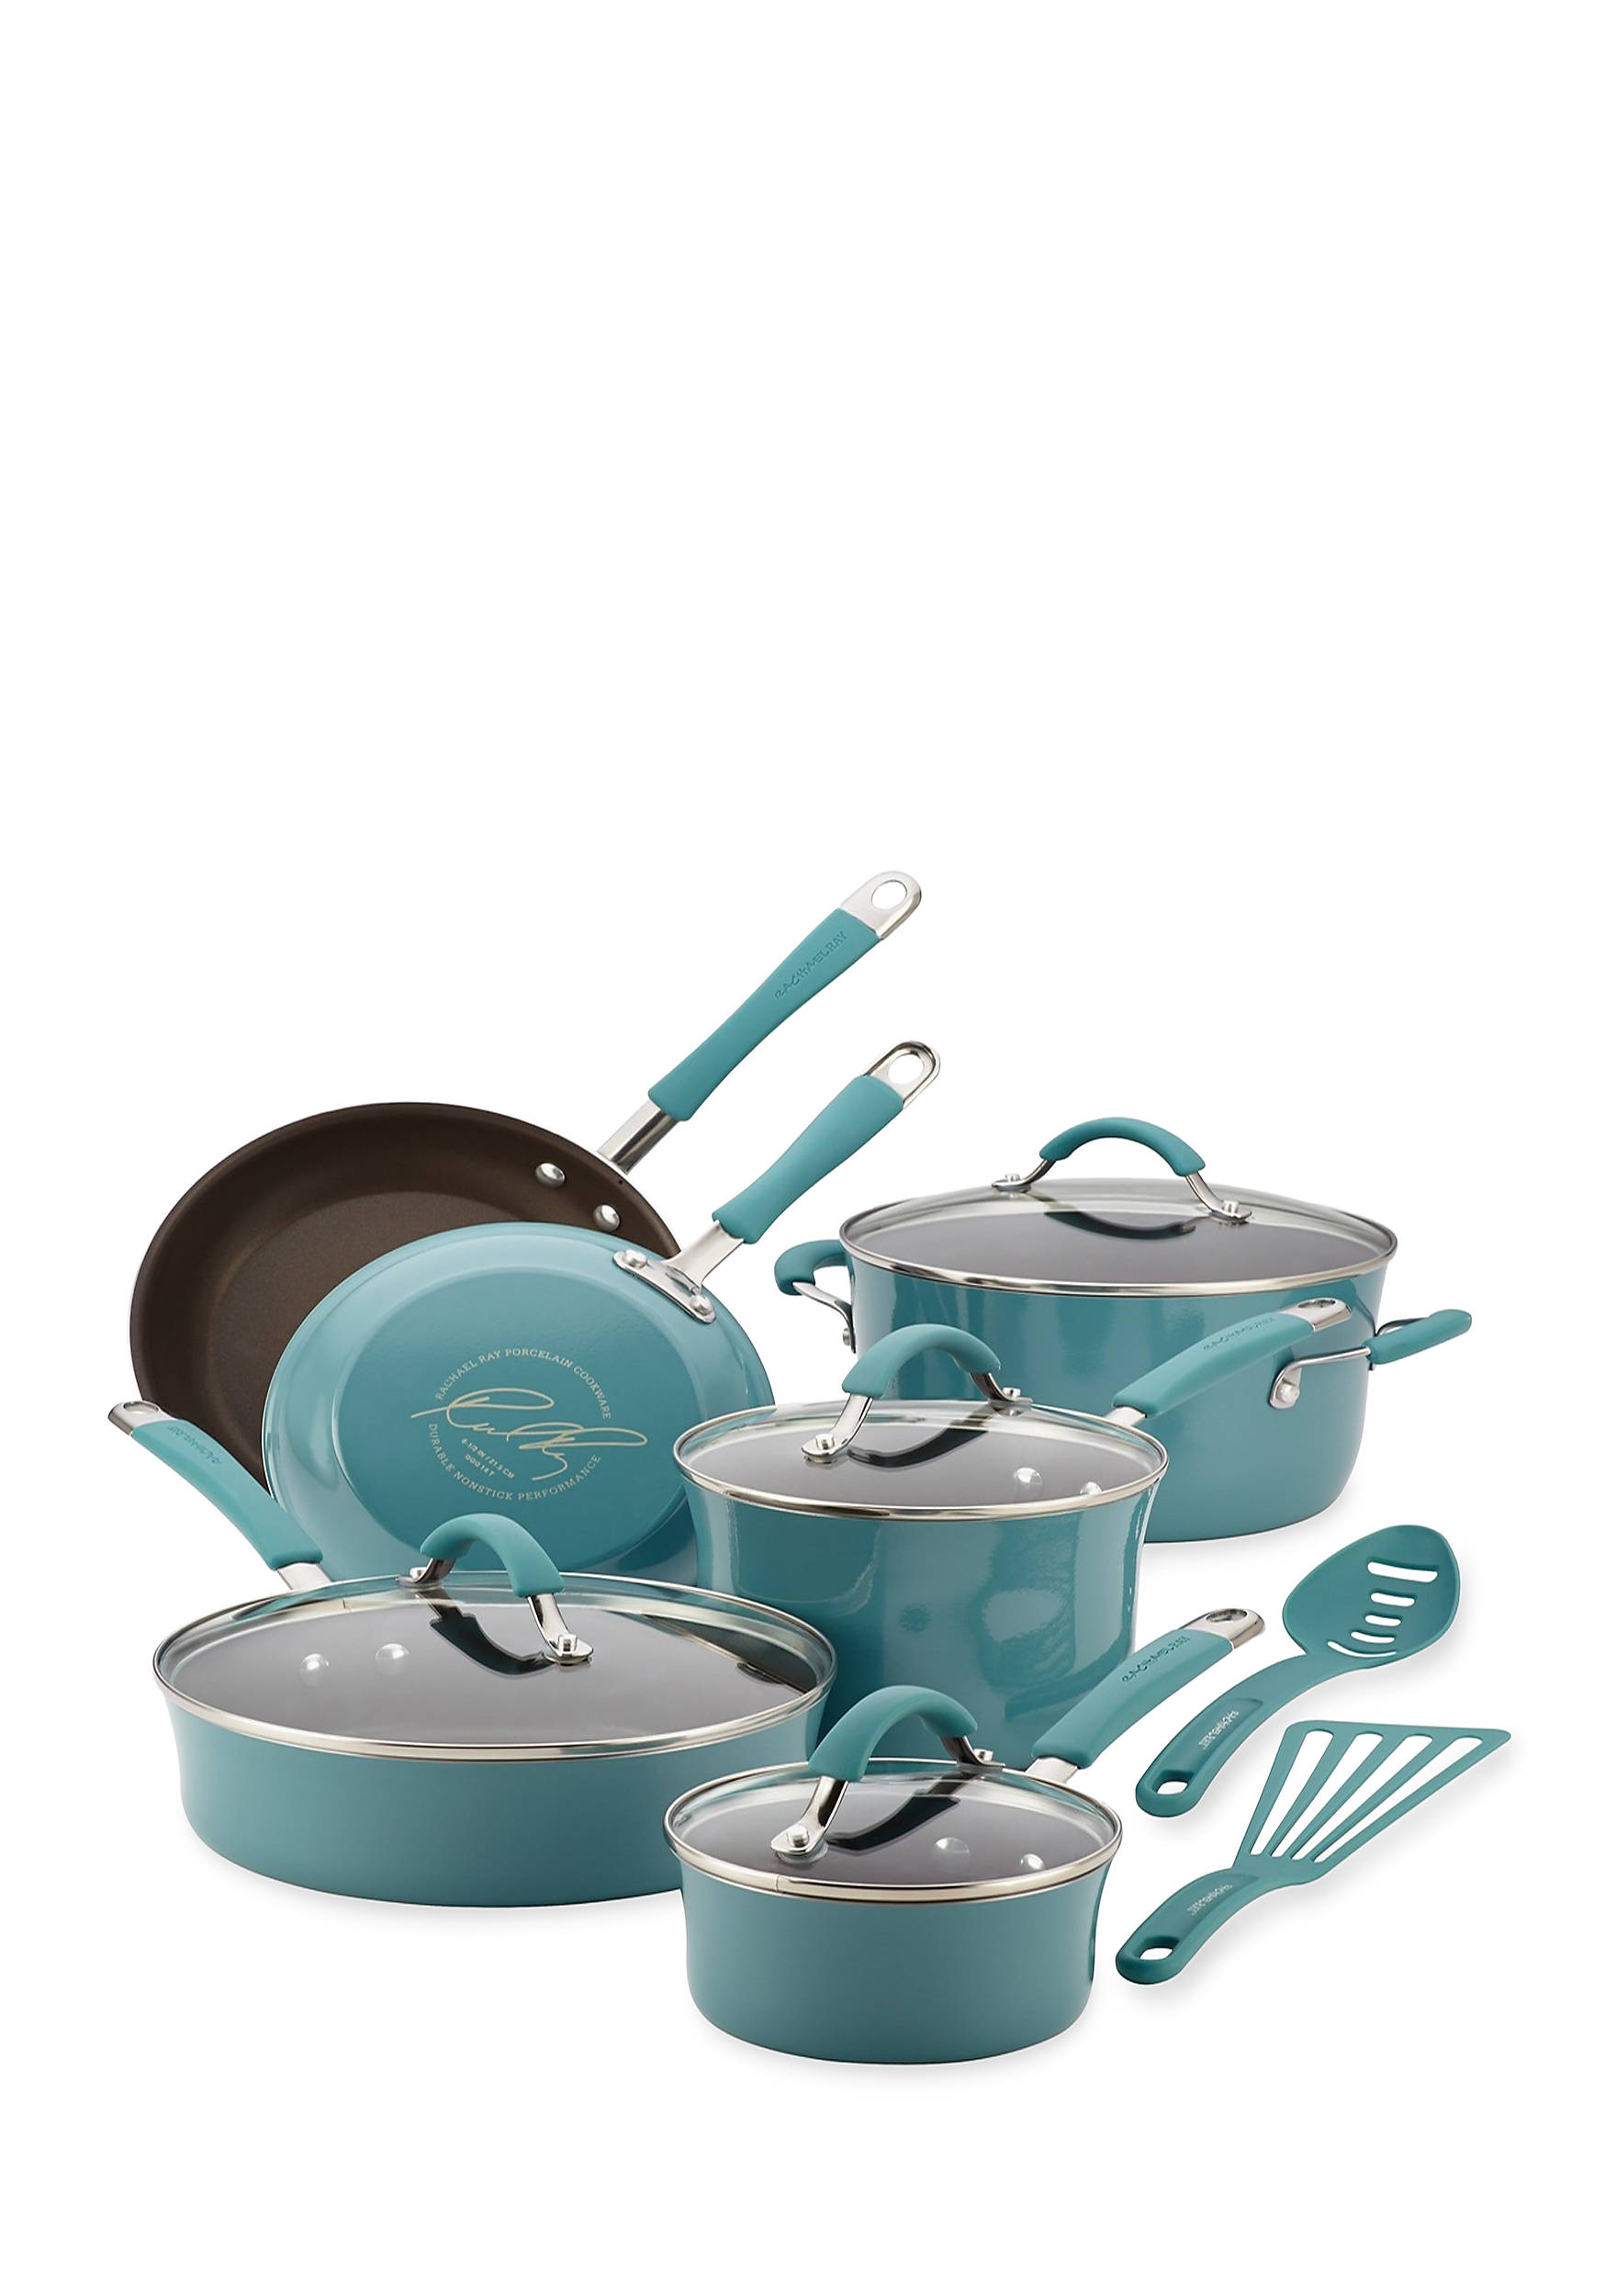 Rachael Ray Cucina Hard Enamel Nonstick 12-Piece Cookware Set, Agave ...